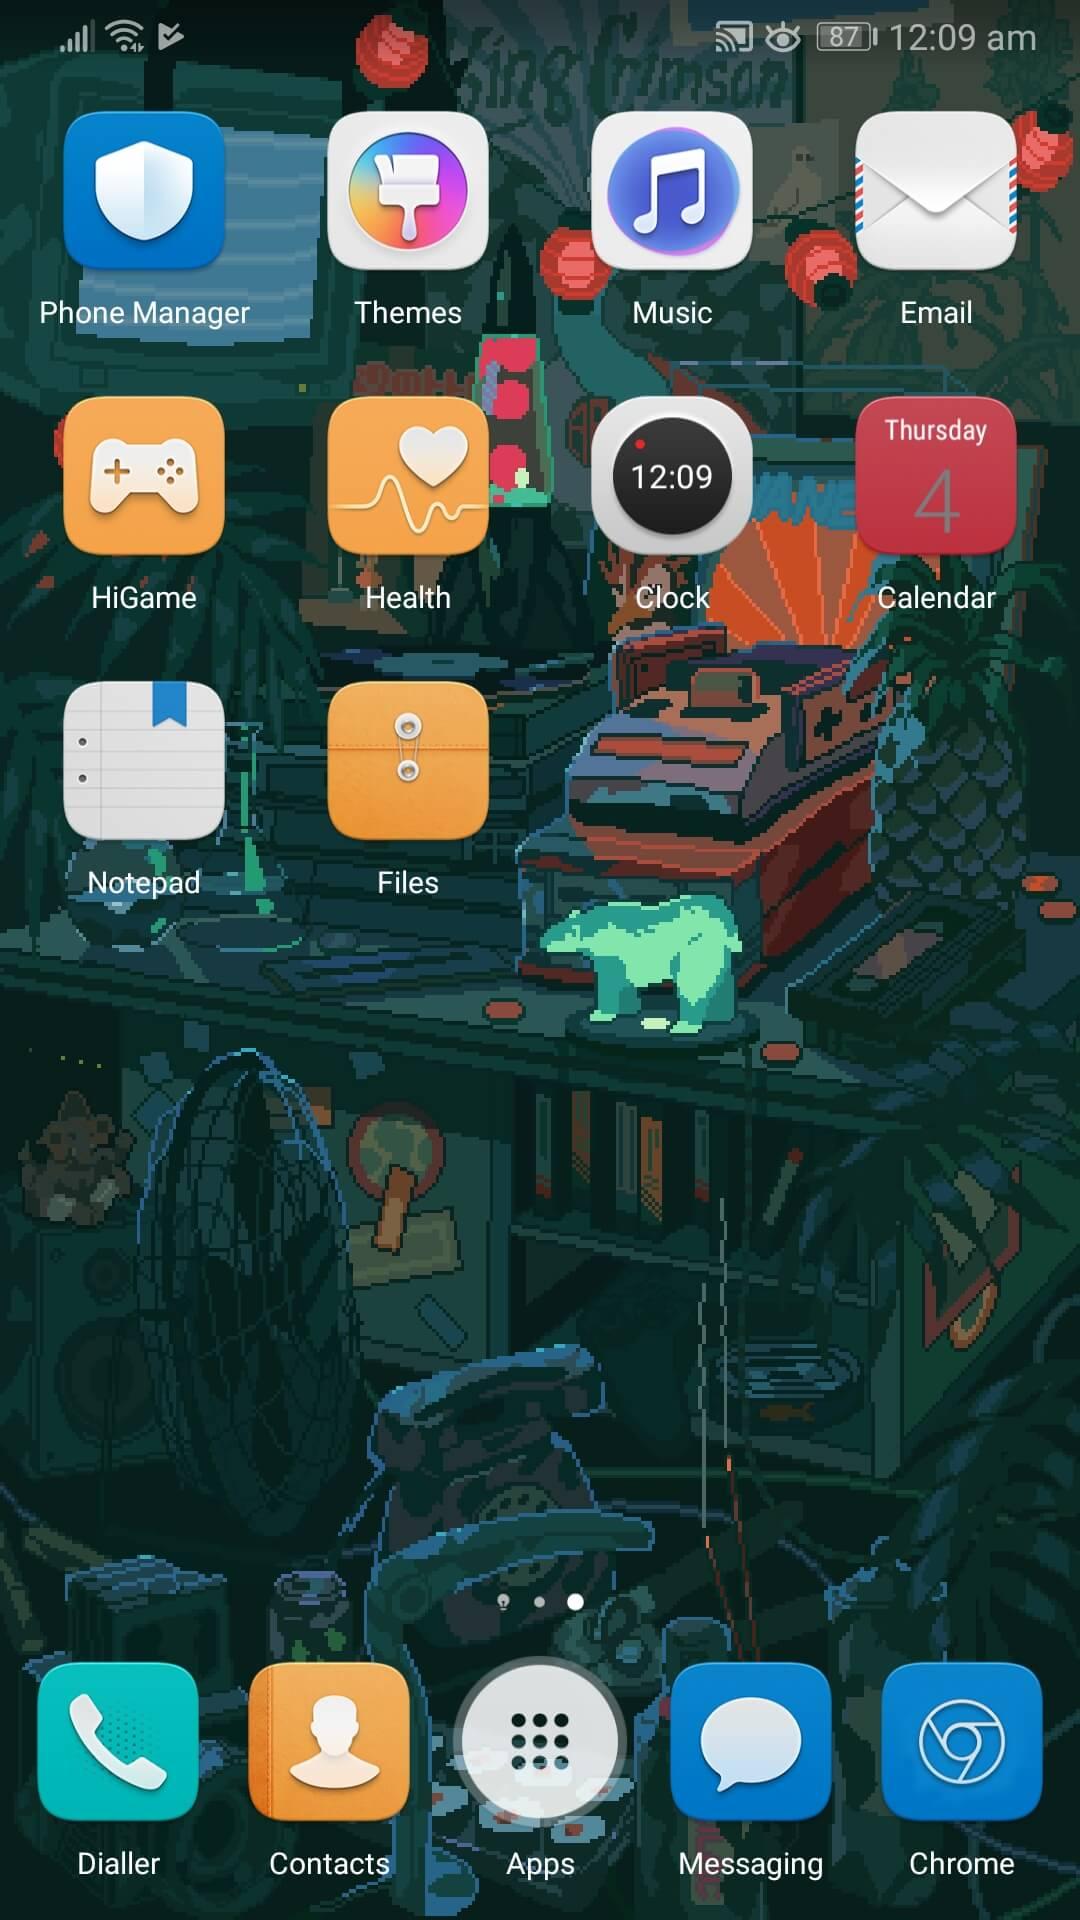 Best-android-live-wallpaper-pixalwave-8-bit (2)